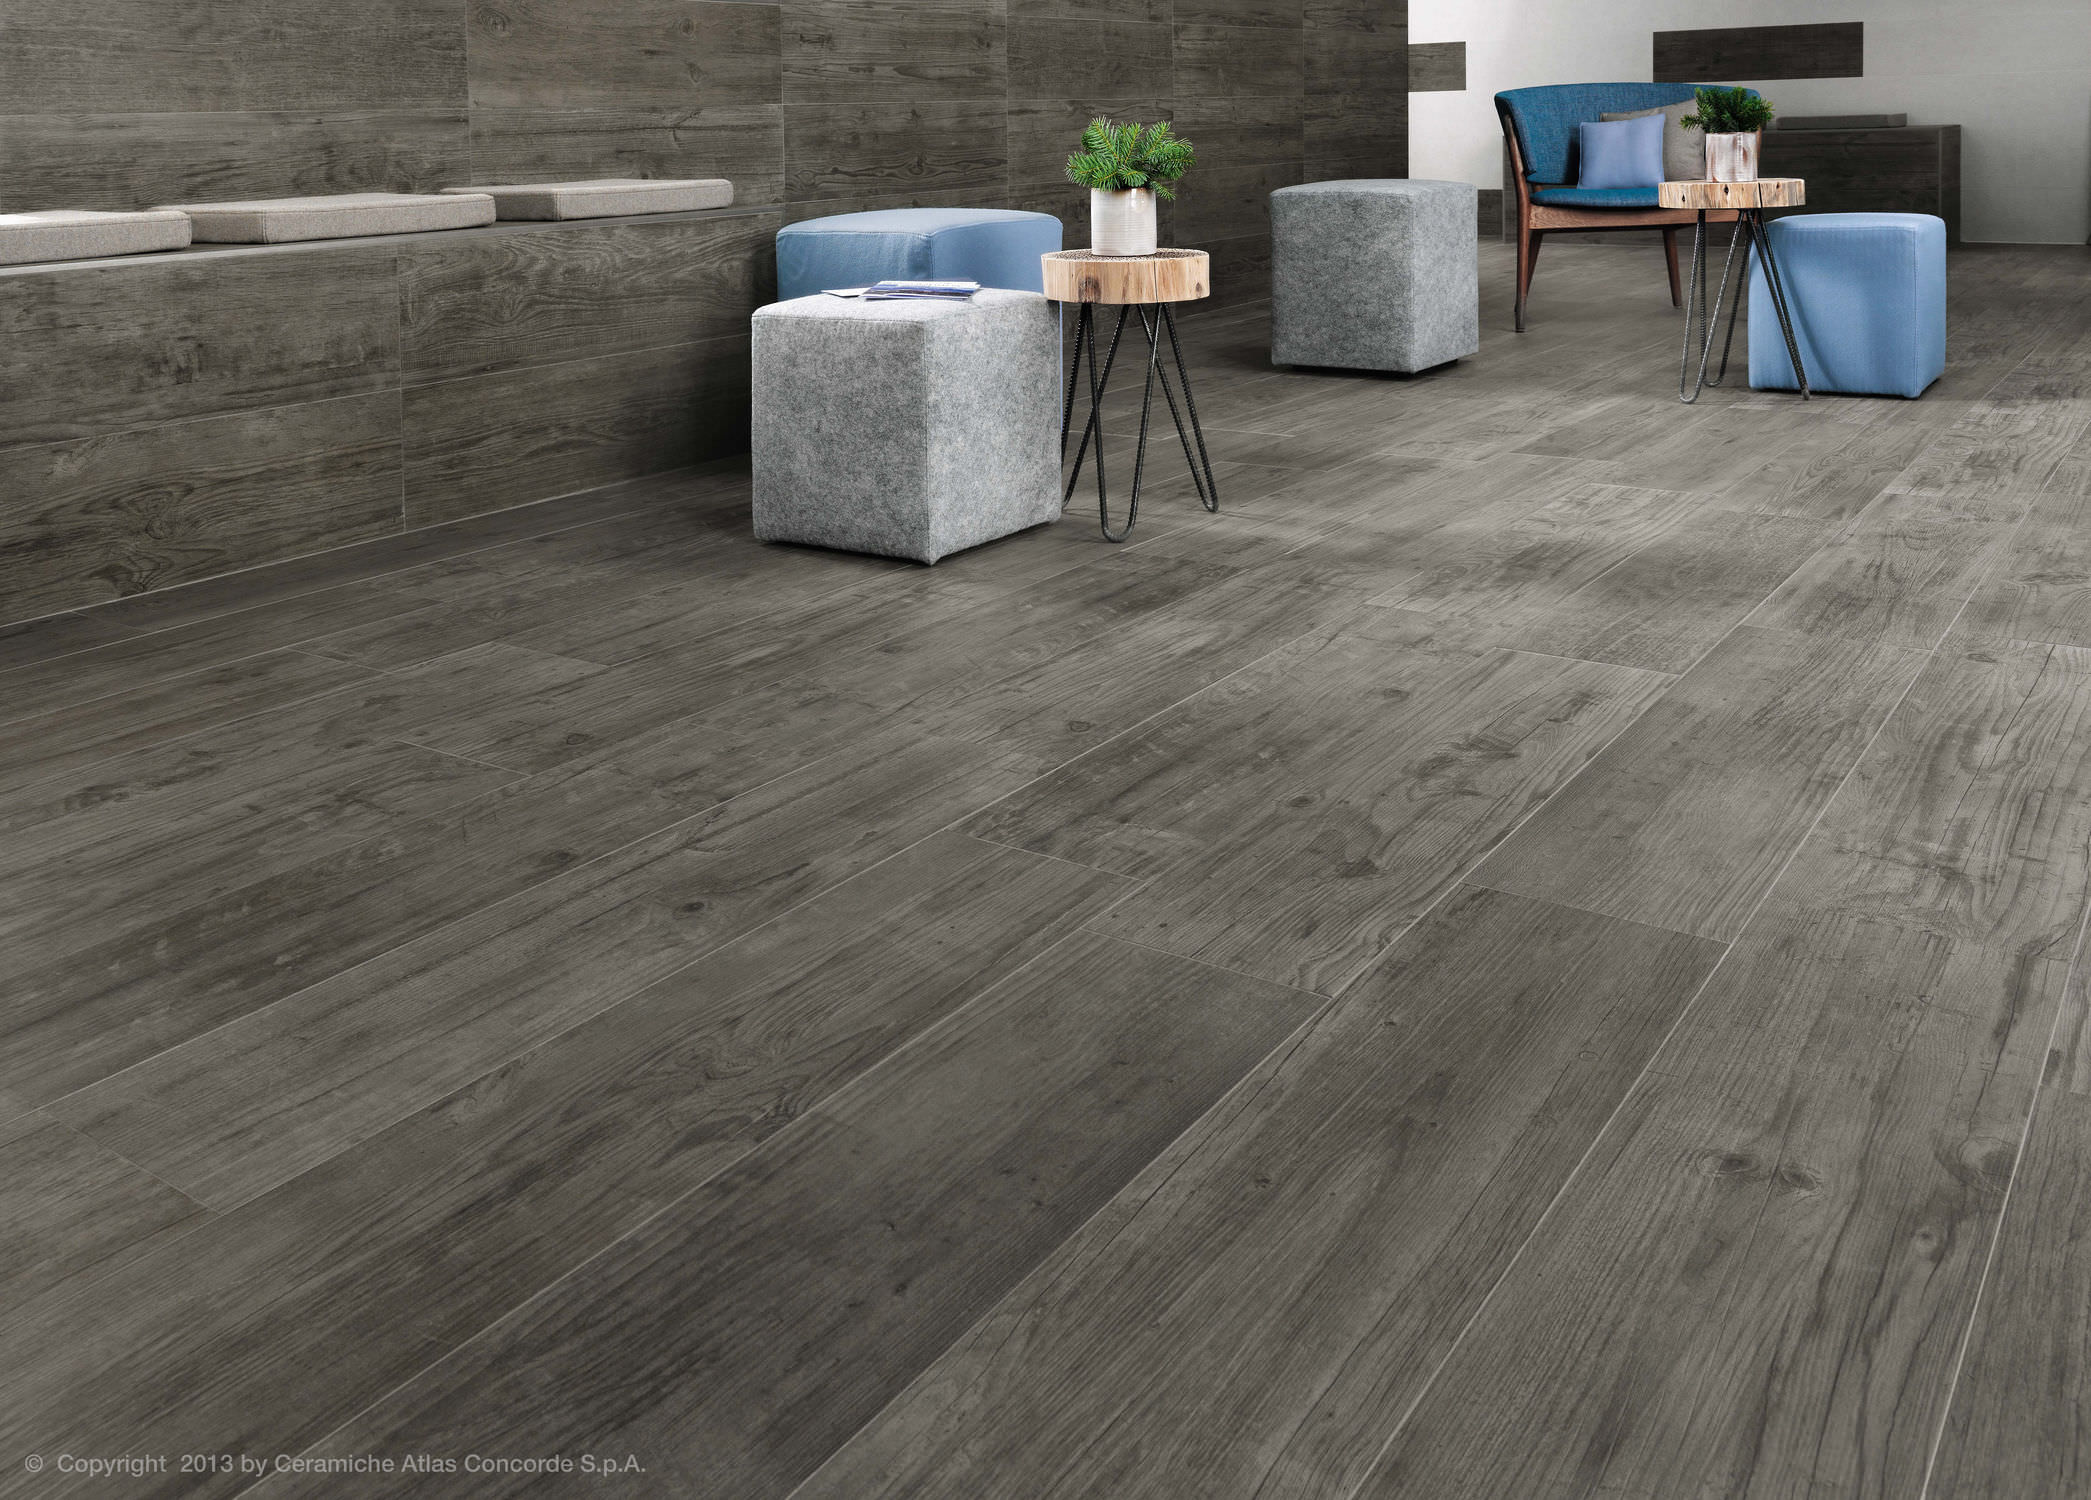 Indoor tile for floors porcelain stoneware matte AXI Atlas